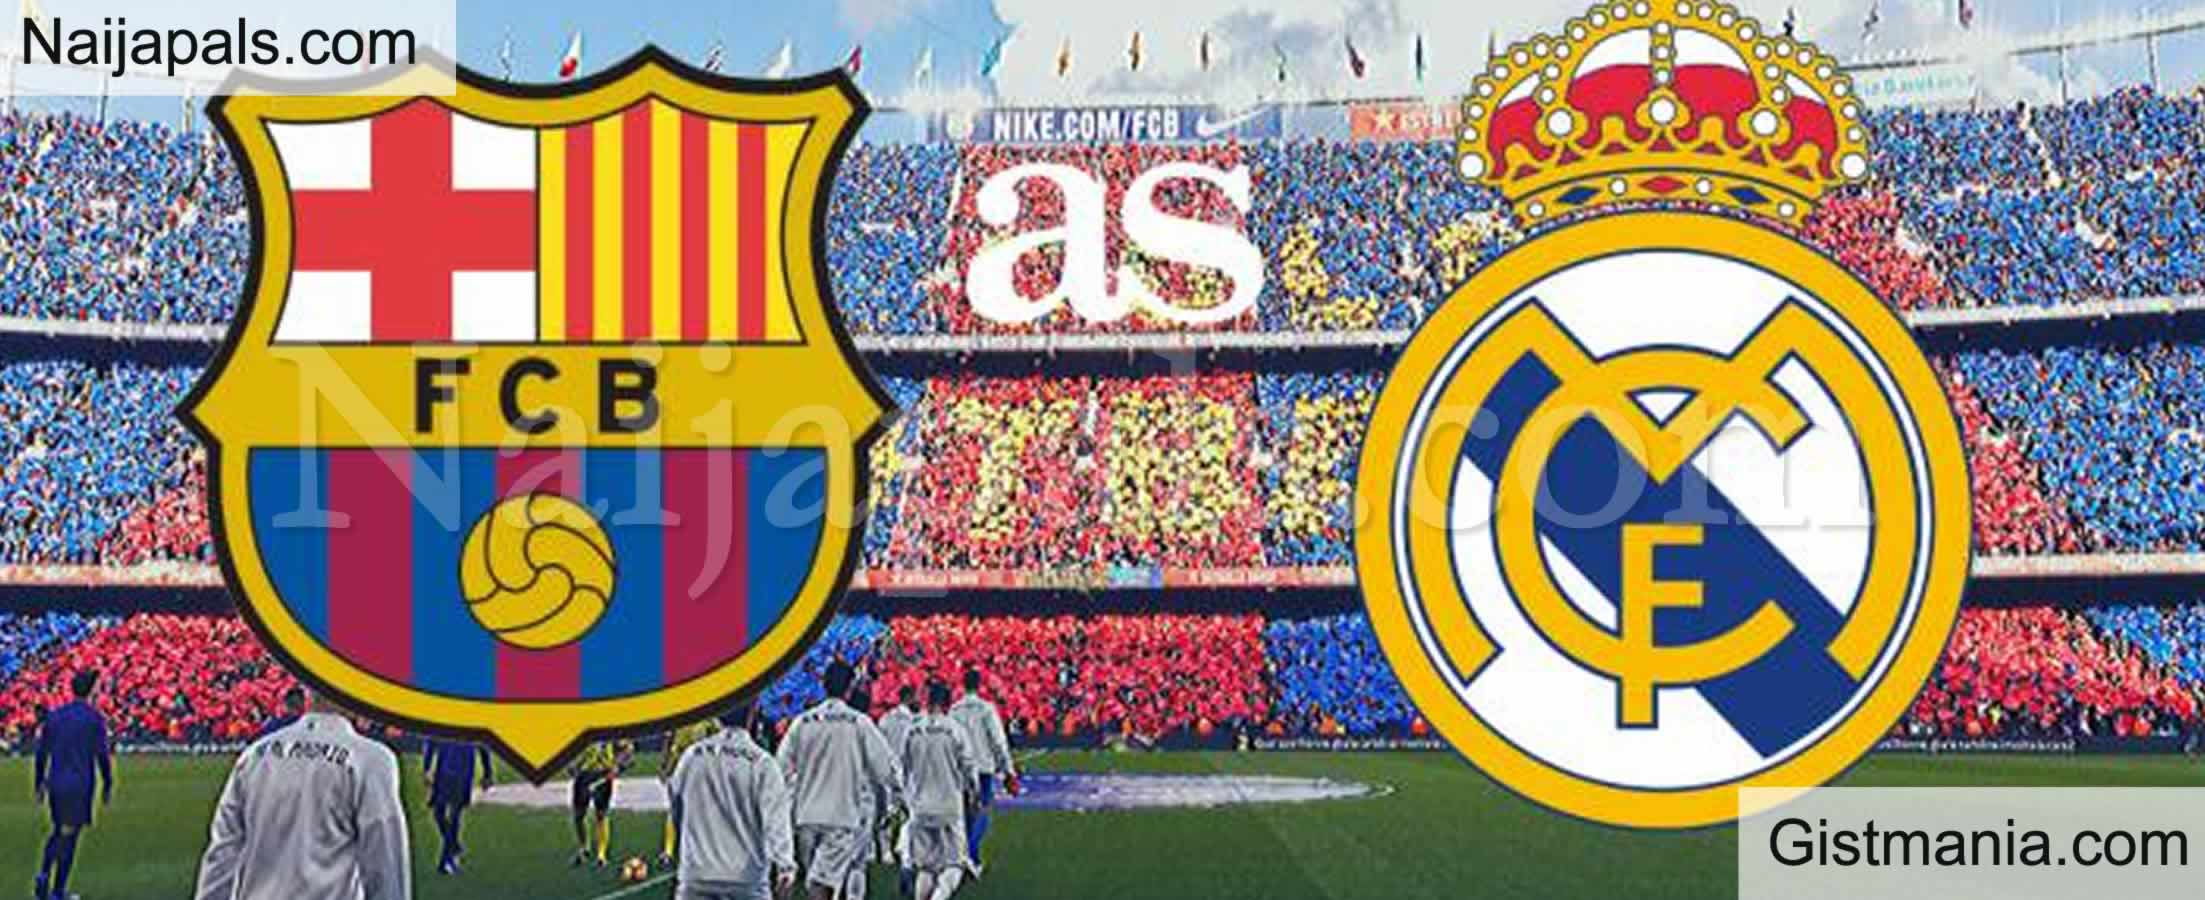 <img alt='.' class='lazyload' data-src='https://img.gistmania.com/emot/soccer.gif' /> <b>Barcelona vs Real Madrid : Spanish La Liga, El Clasico Match, Team News, Goal Scorers and Stats</b>